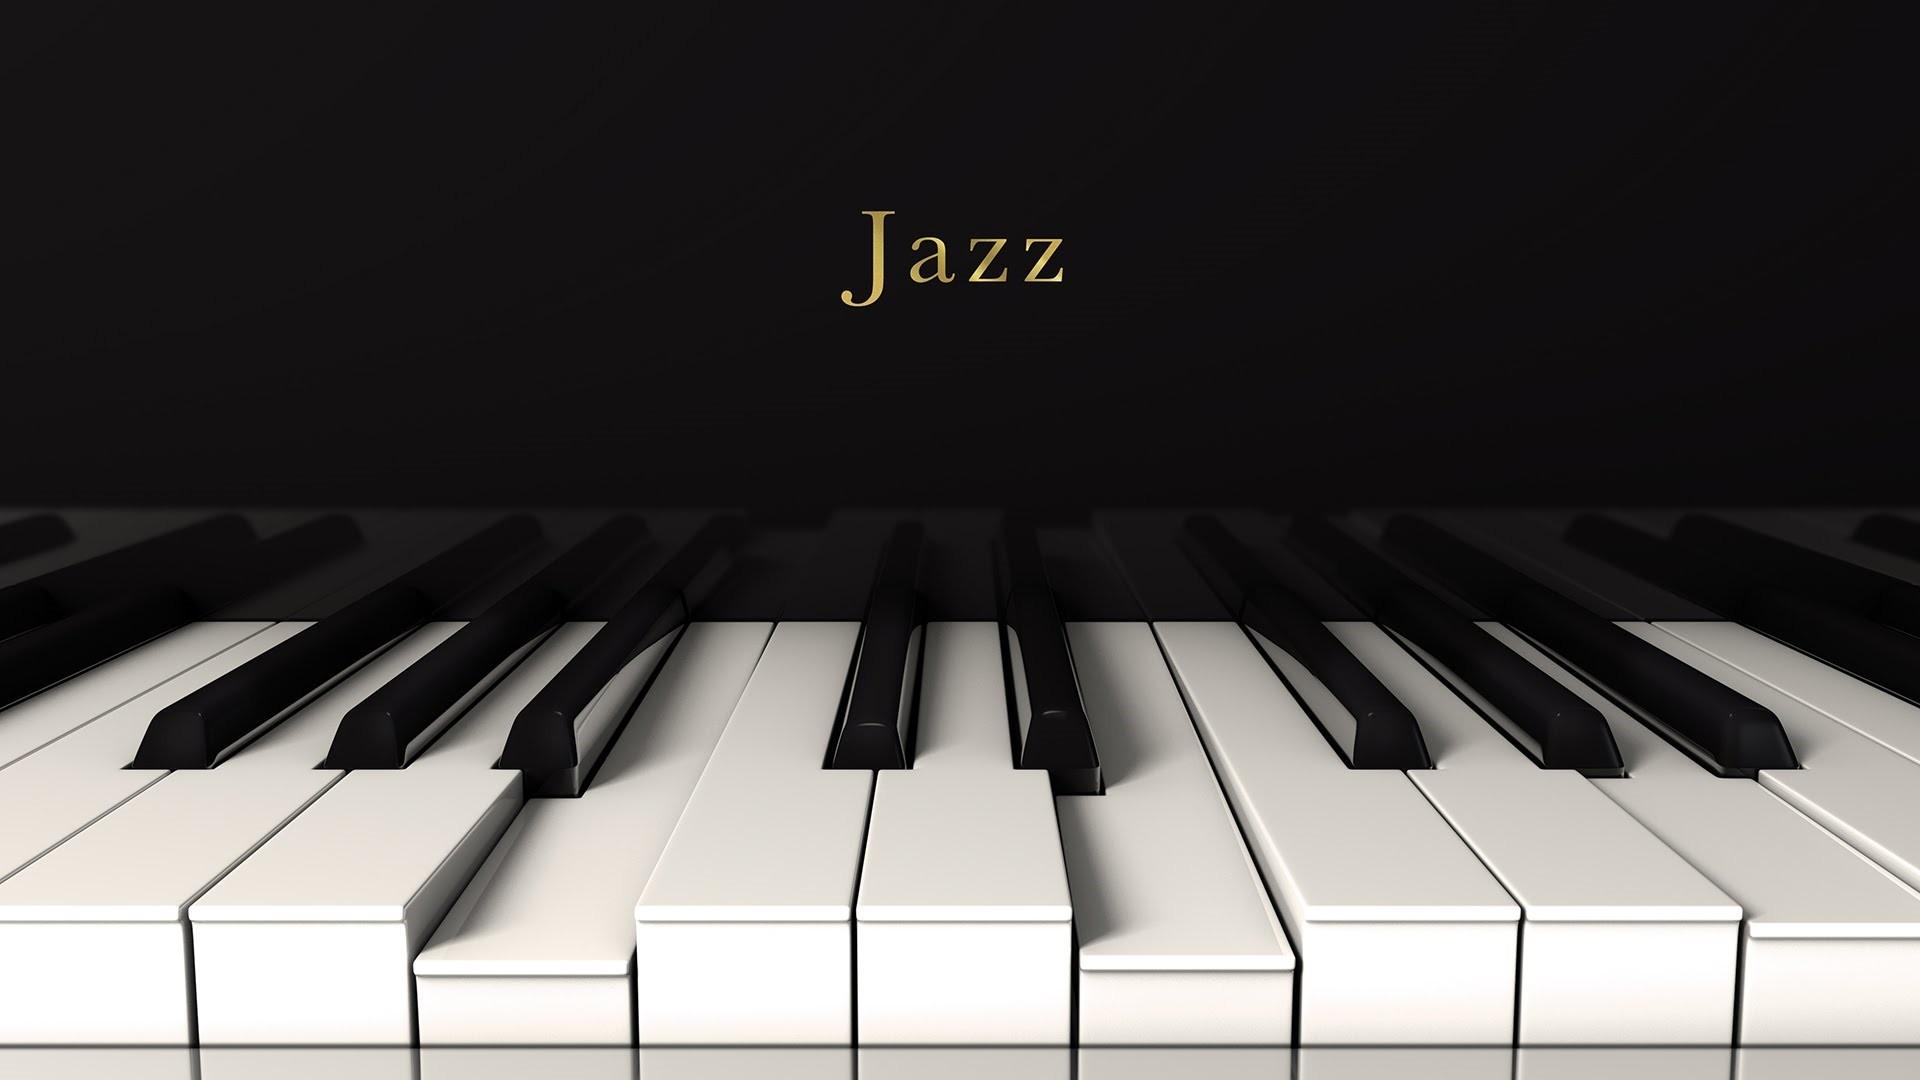 Piano wallpaper photo hd